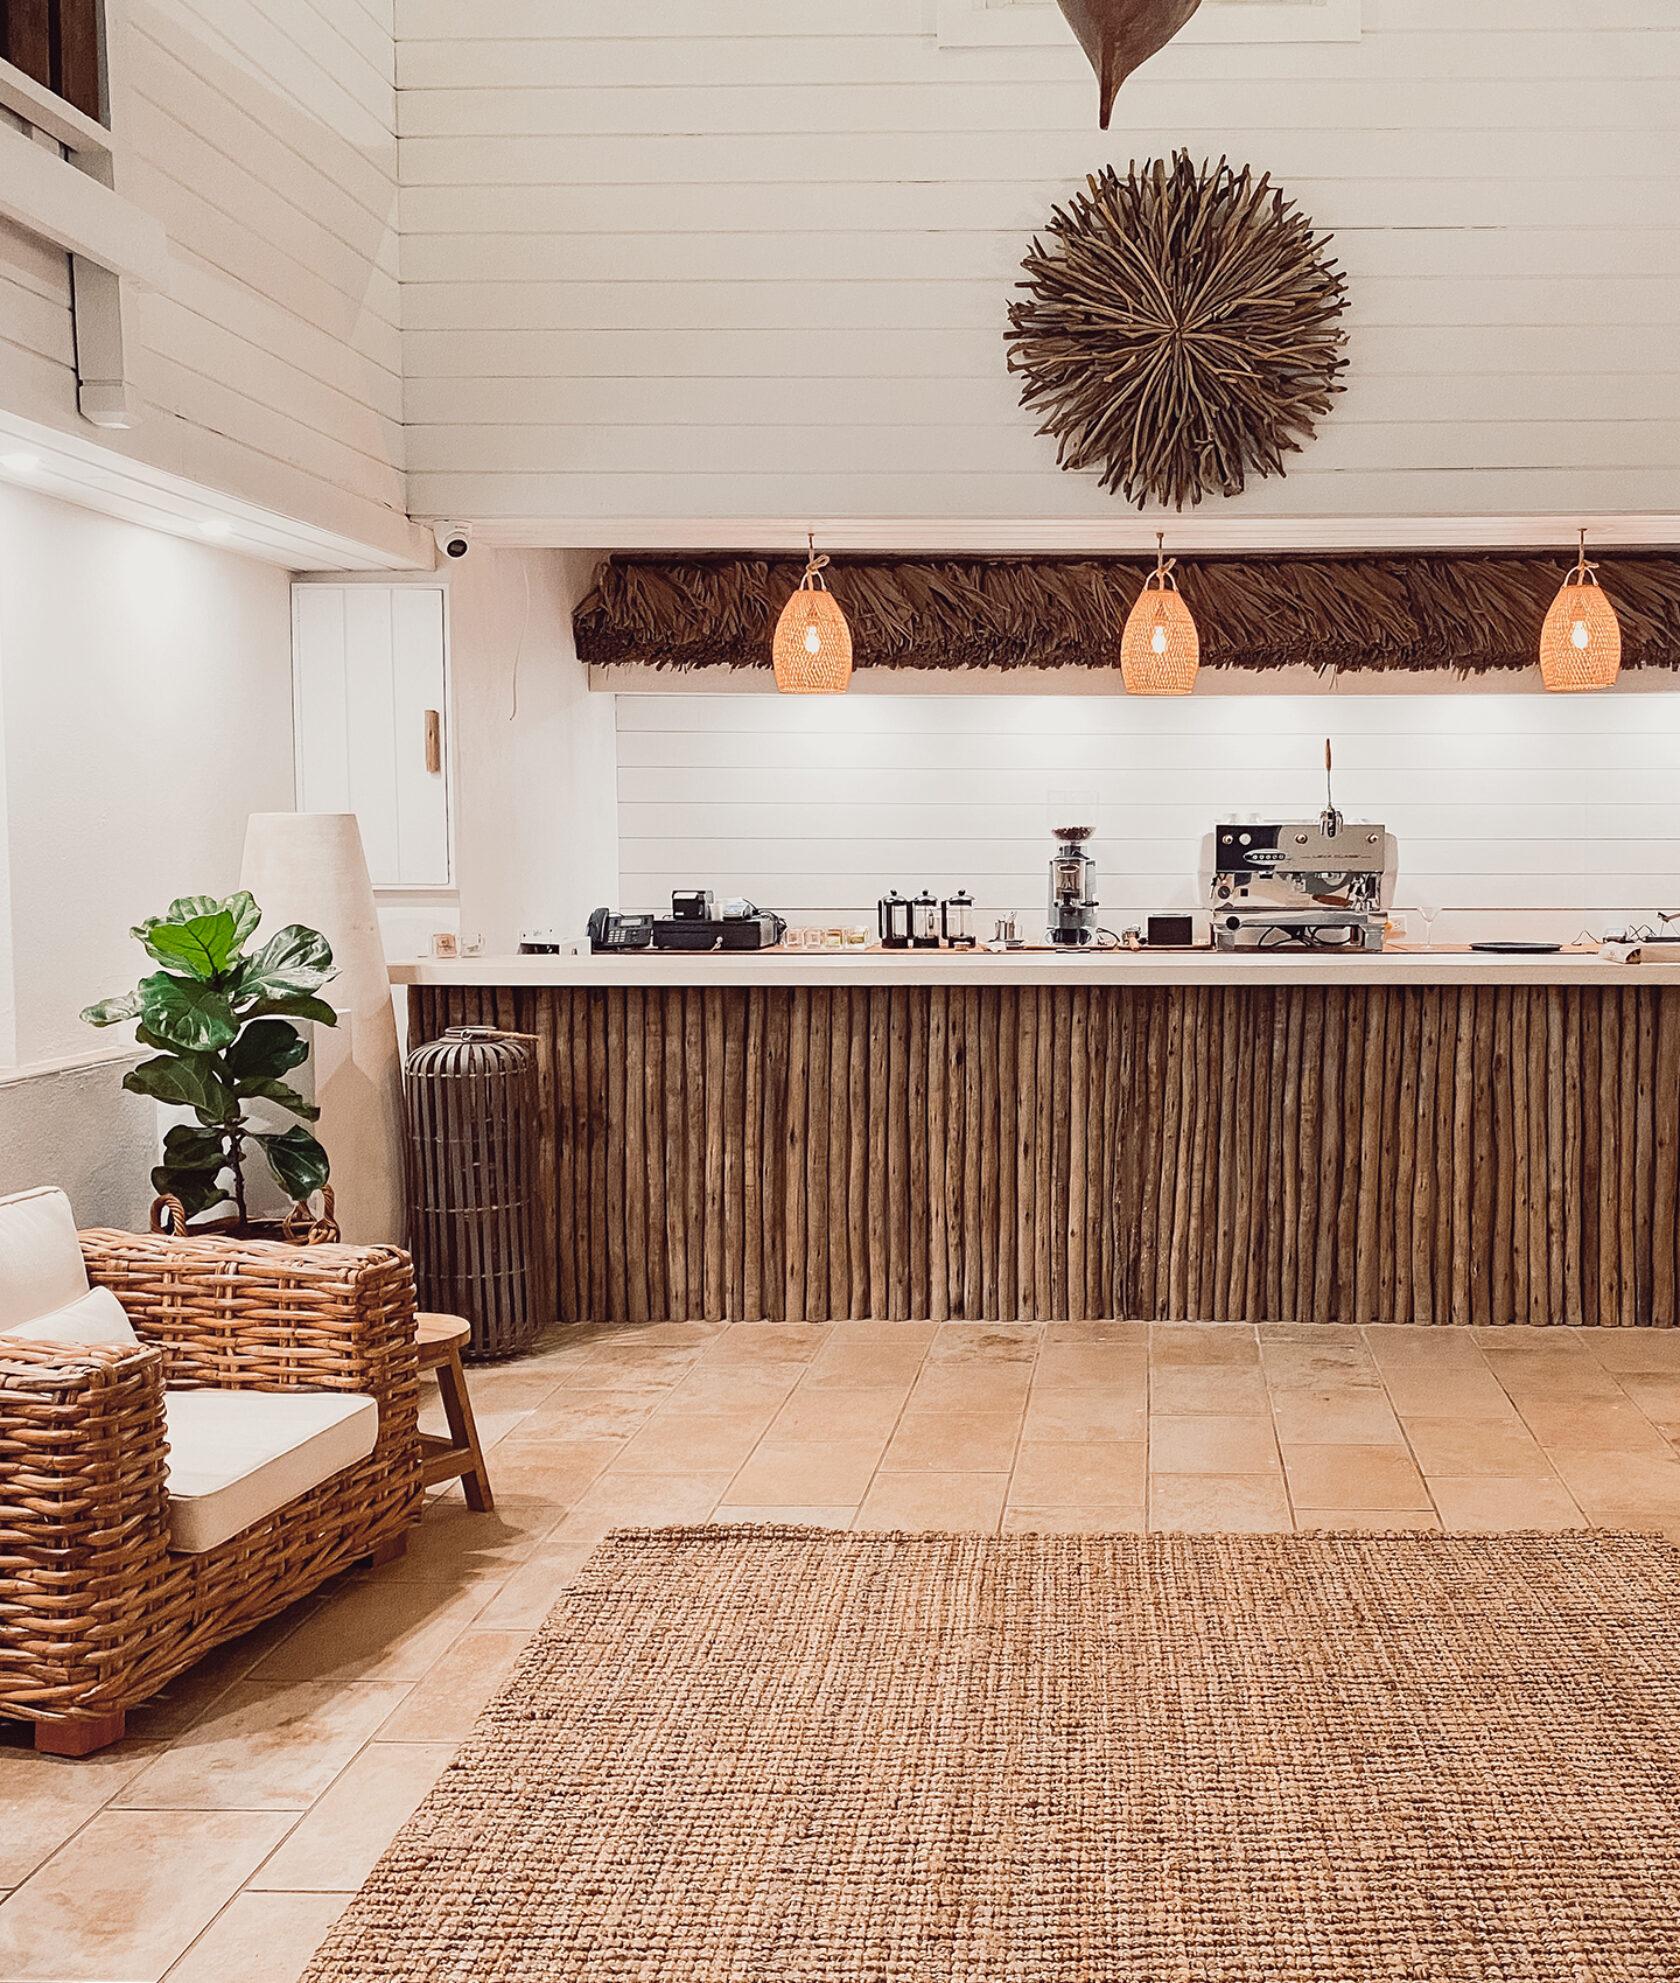 1748 Coffee Shop at Long Bay Beach Resort